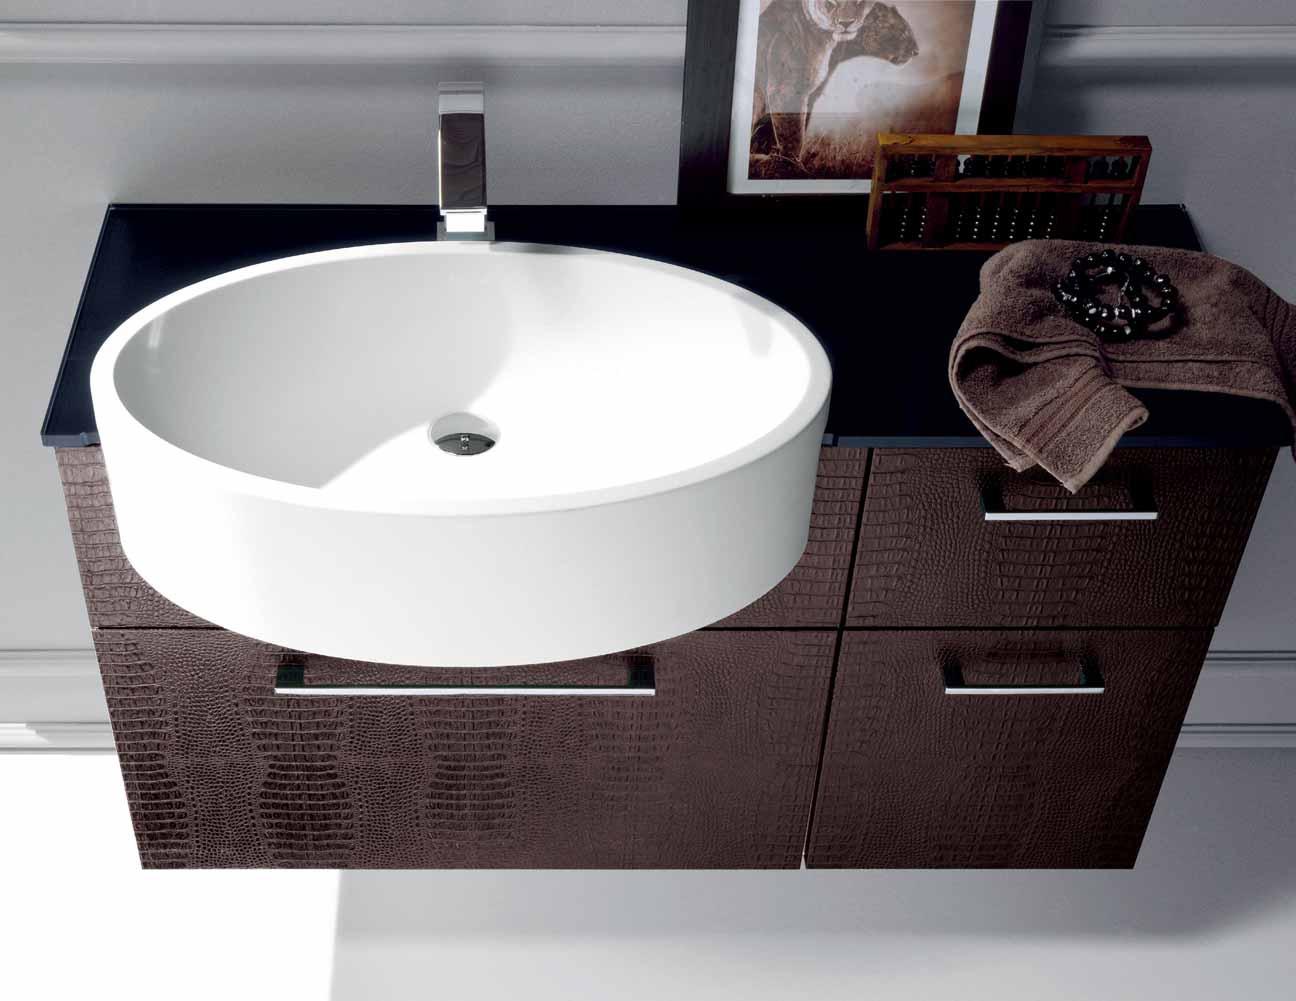 categorie kios mobili e arredo bagno zona bagno tag addeo ante bagno ...